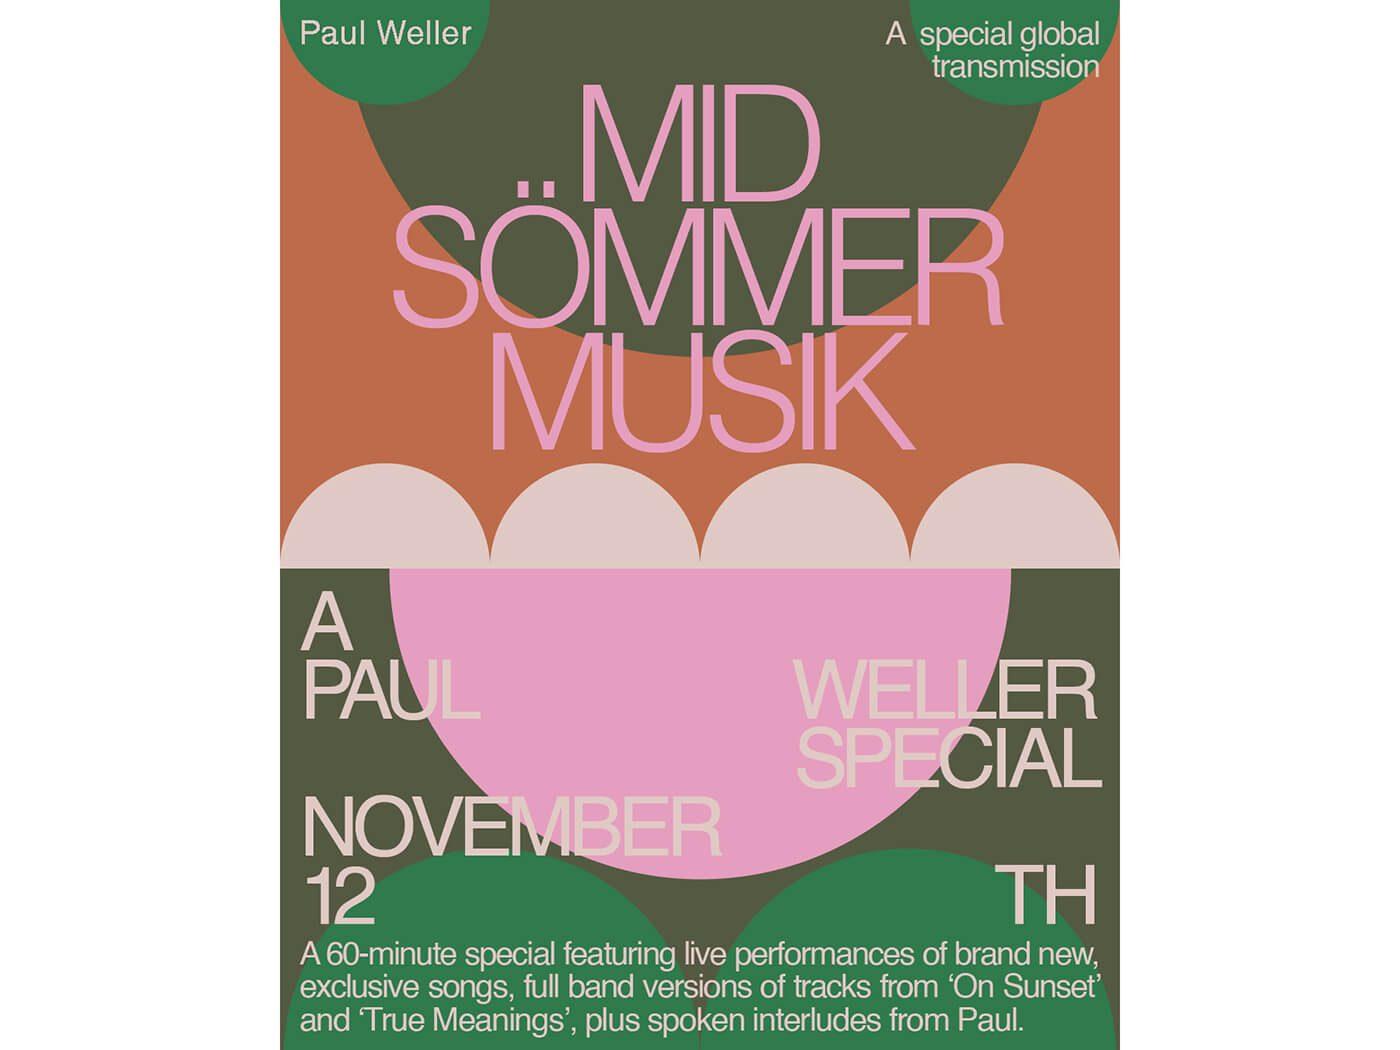 Paul Weller announces live special, Mid-Sömmer Musik